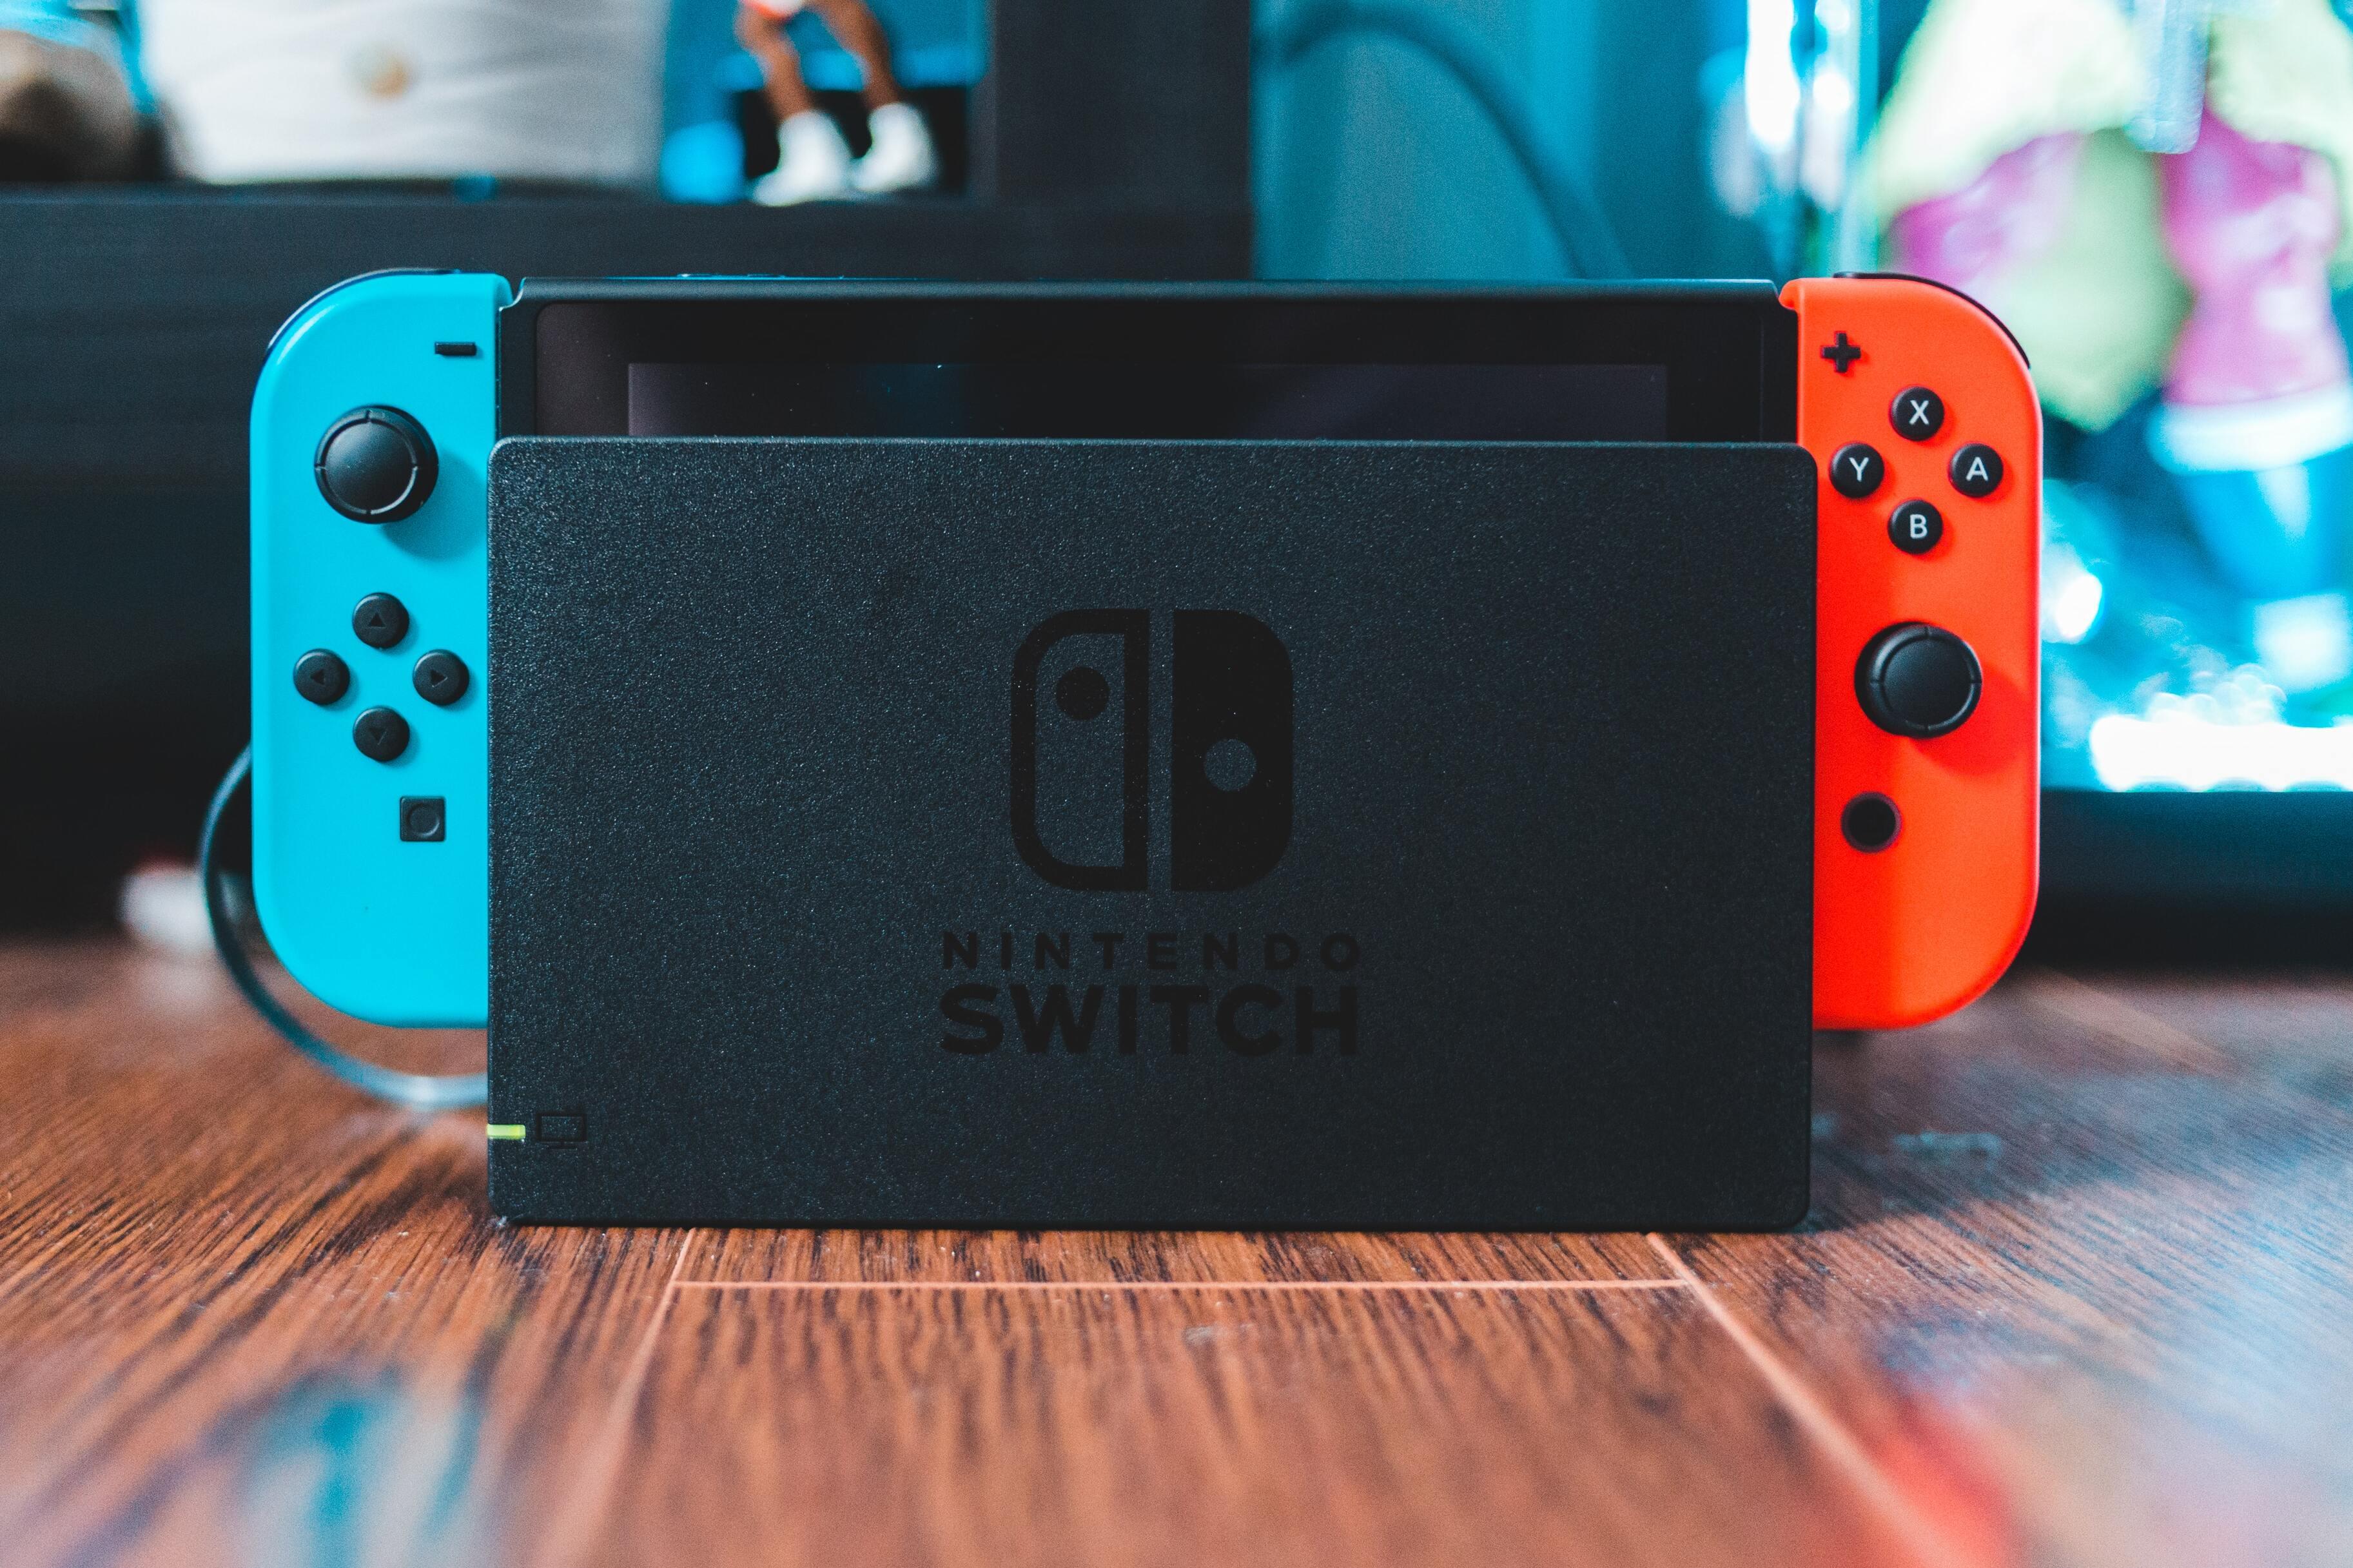 NVIDIA засветила скорый анонс новой версии консоли Nintendo Switch